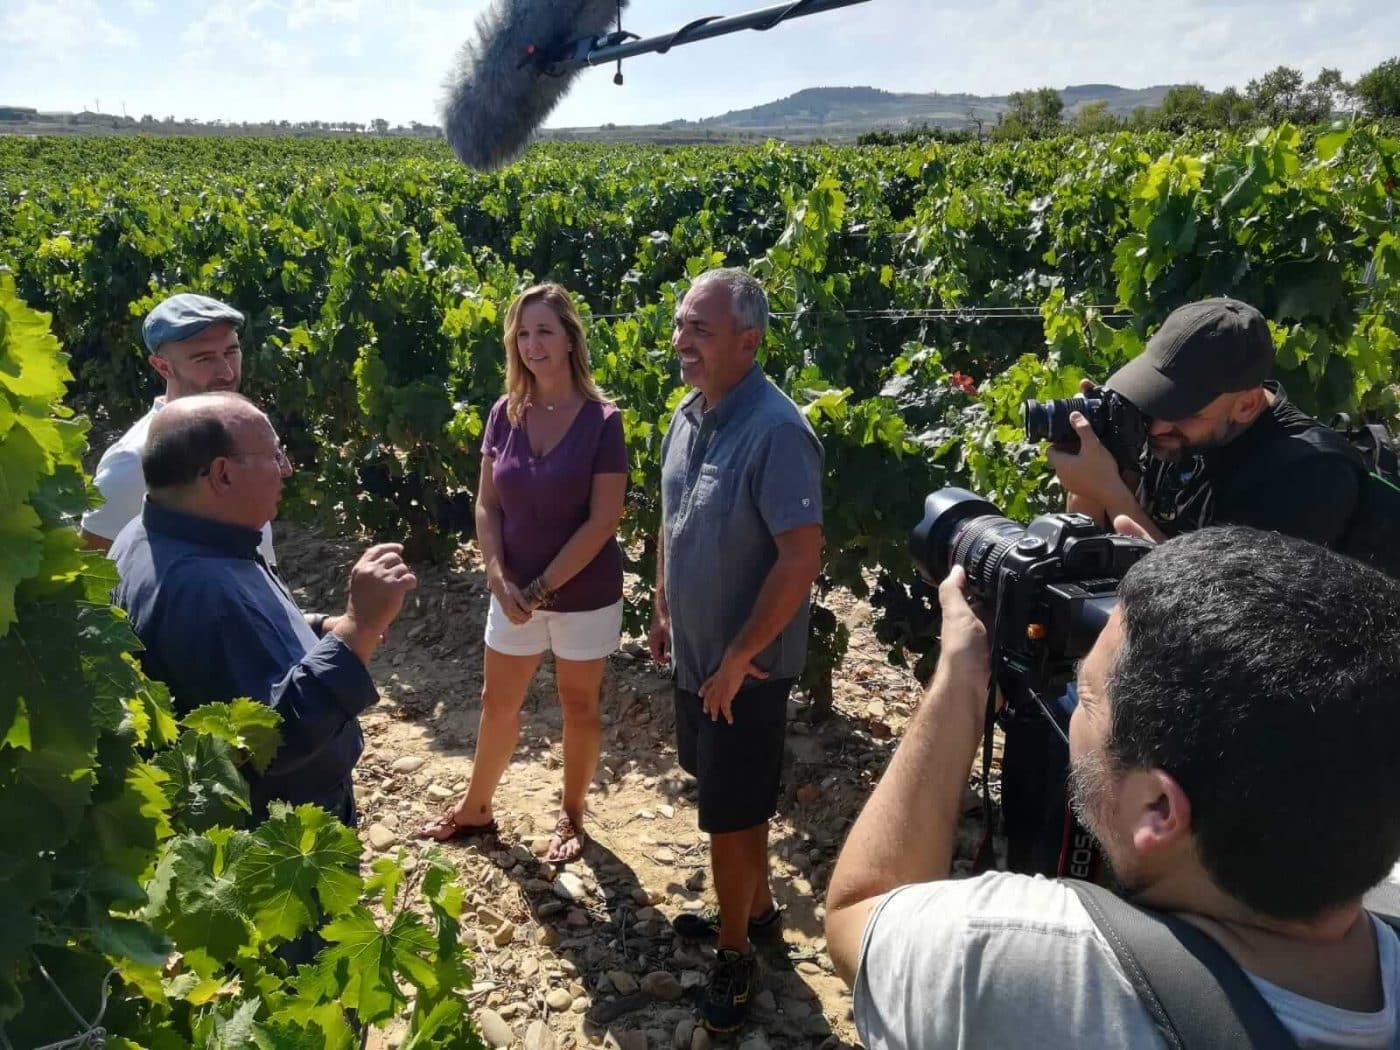 La Rioja Alta, una de las paradas de la serie internacional 'I love wine' 4